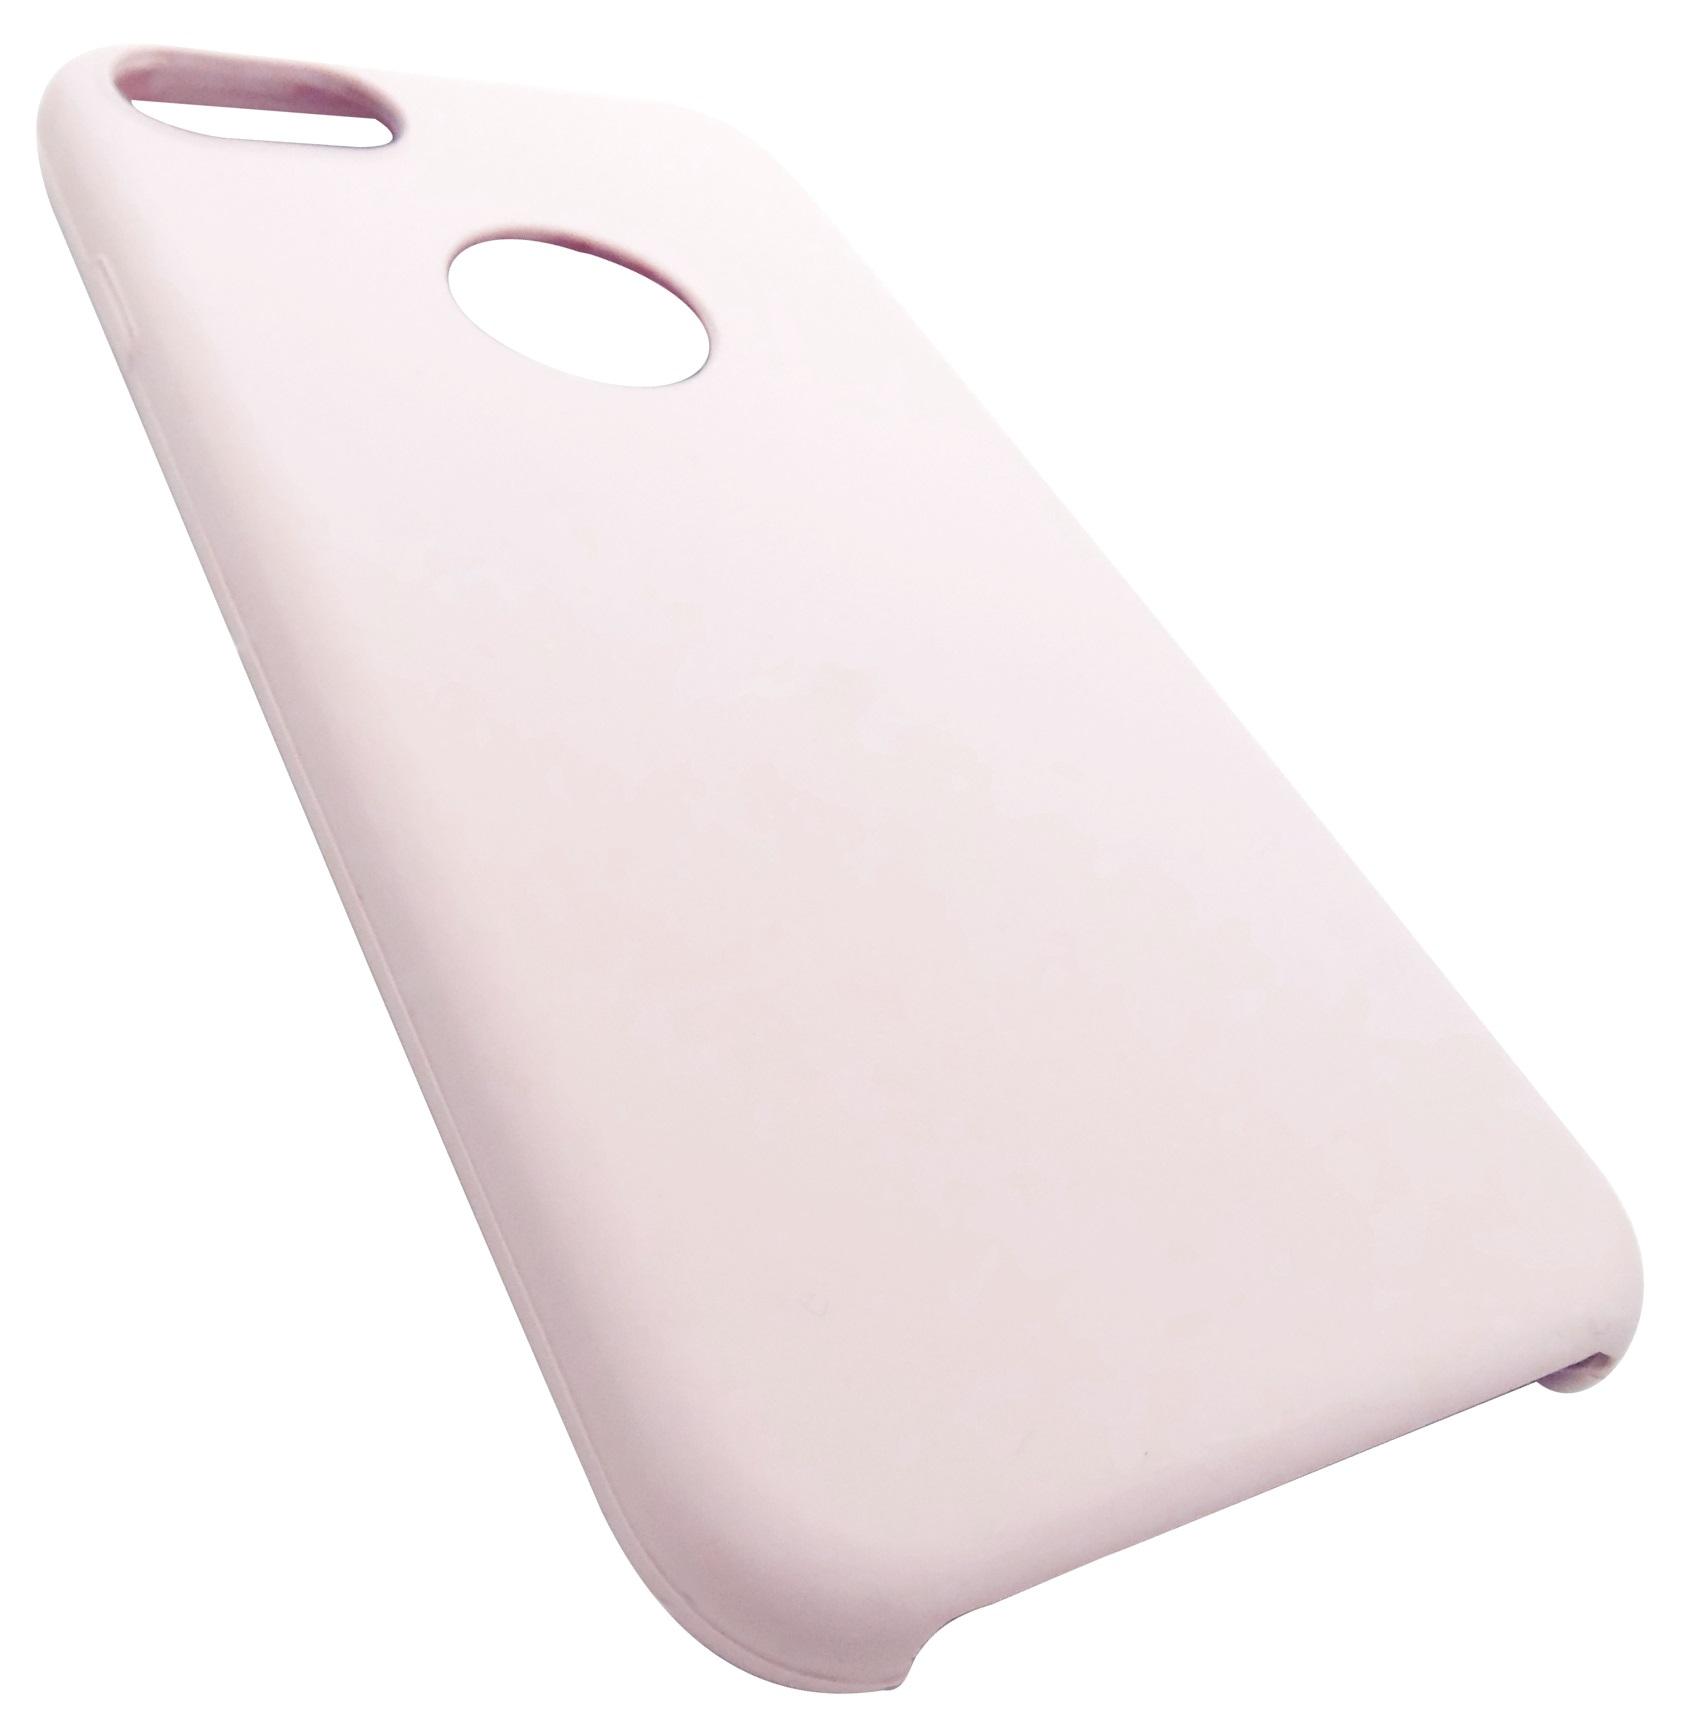 Husa silicon TPU Matte (anti-amprenta, anti-alunecare) roz pentru Apple iPhone 7/8